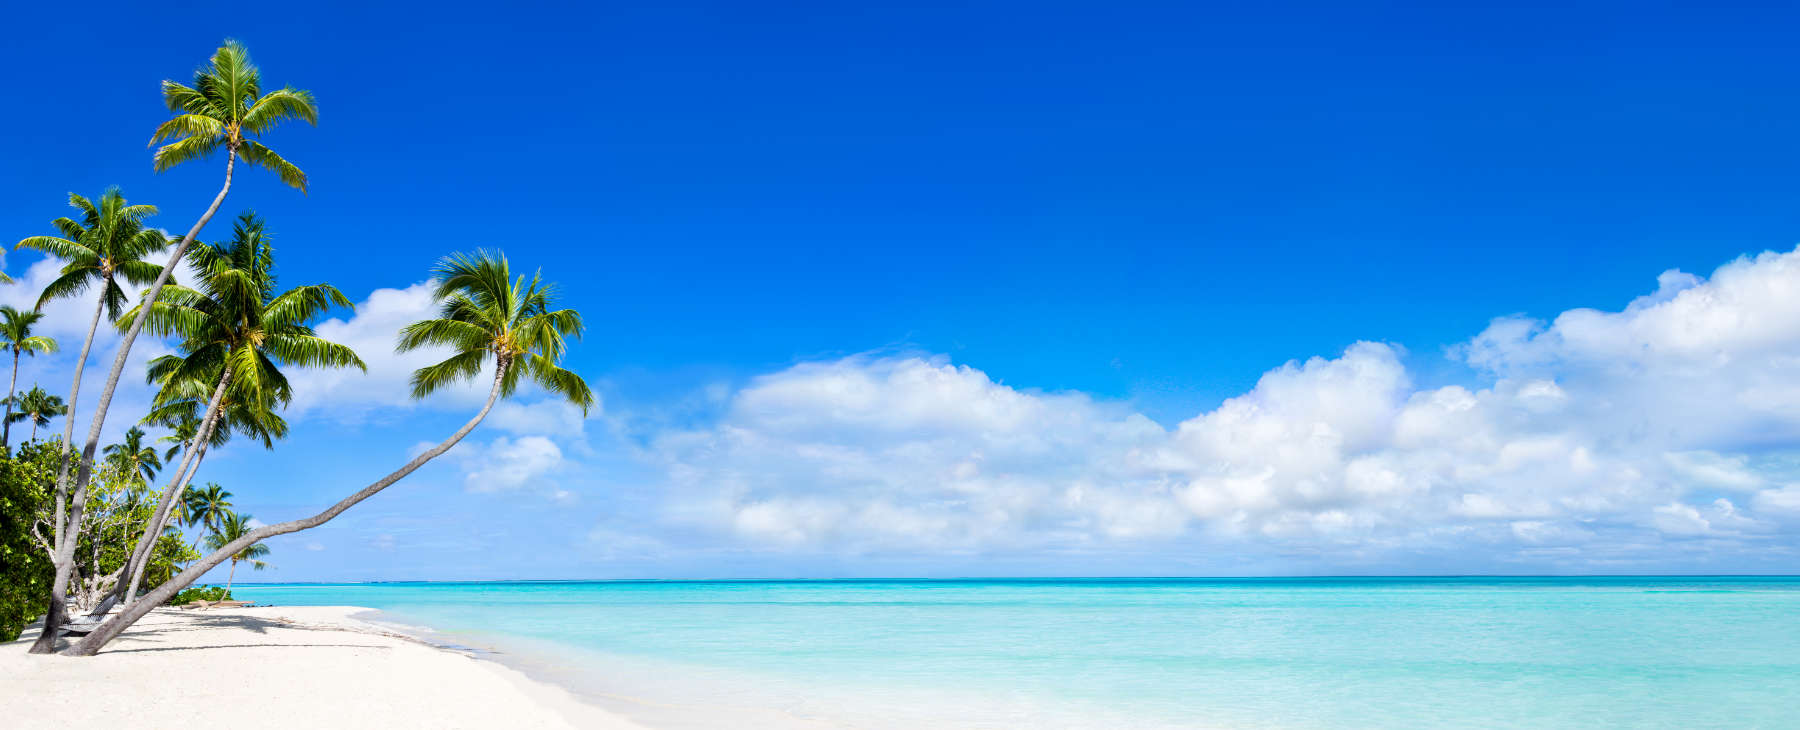 Luxusreisen Karibik – Argentum Reisen